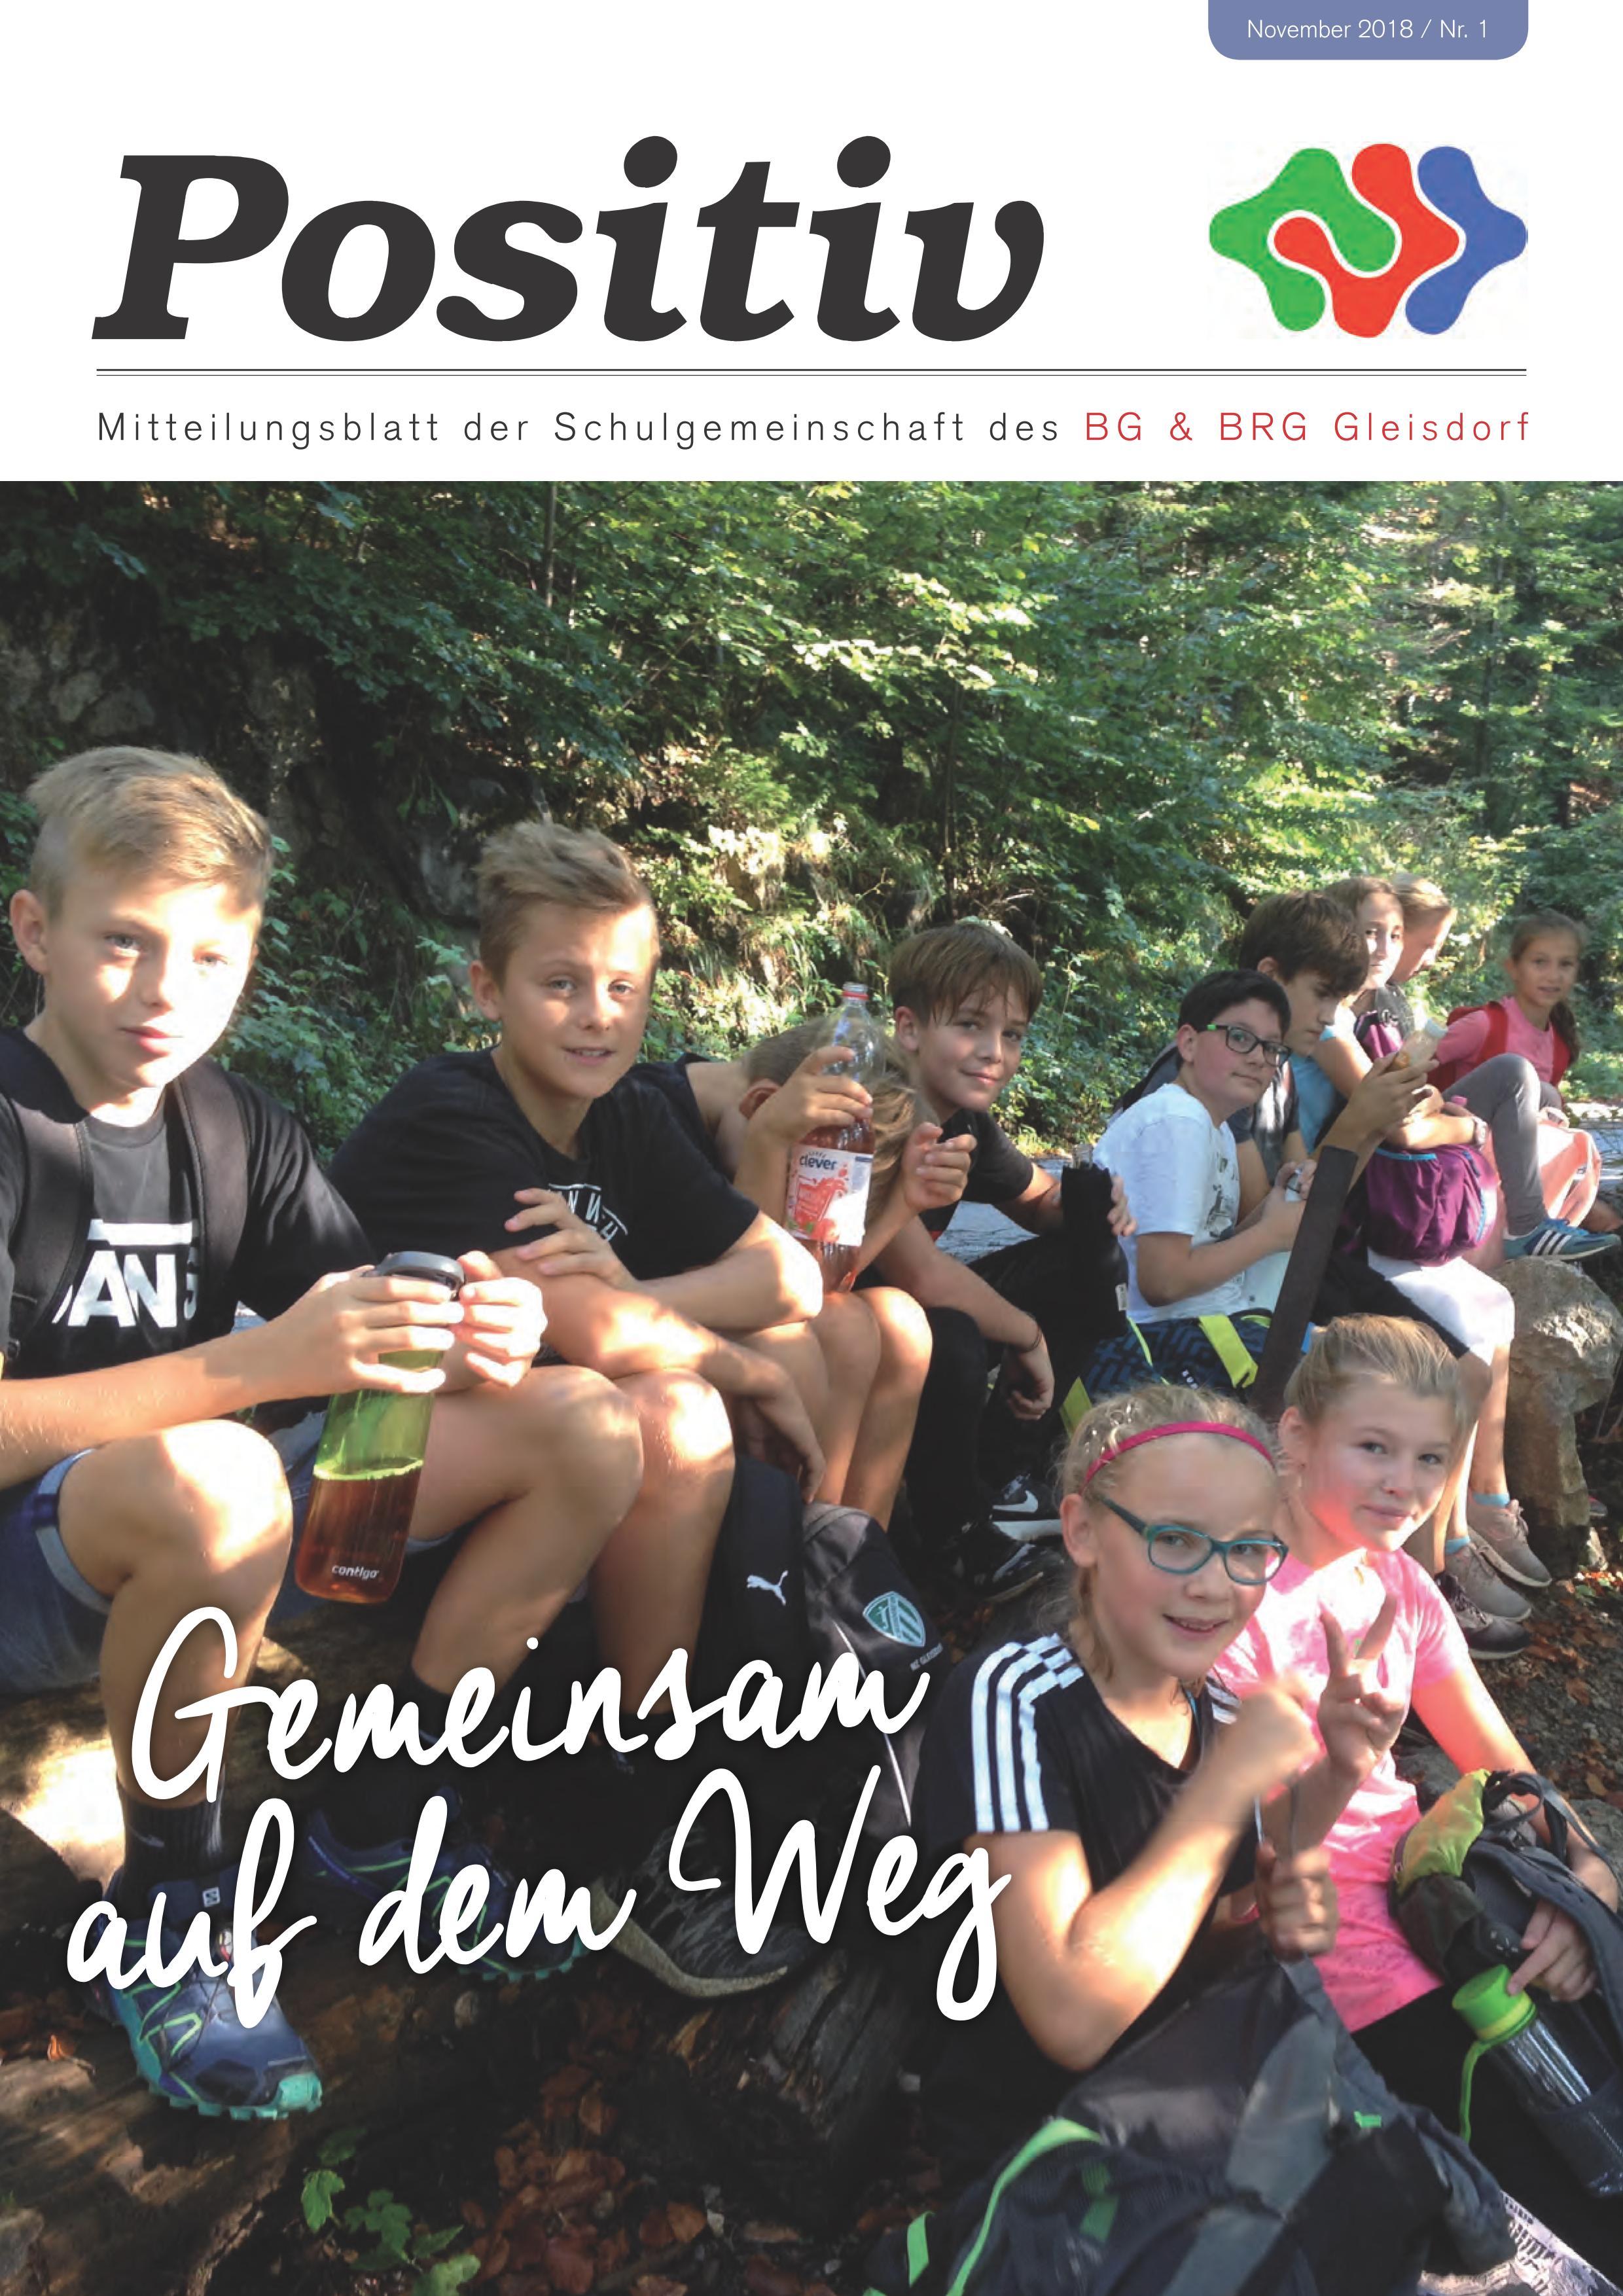 Downloads - BG/BRG Gleisdorf